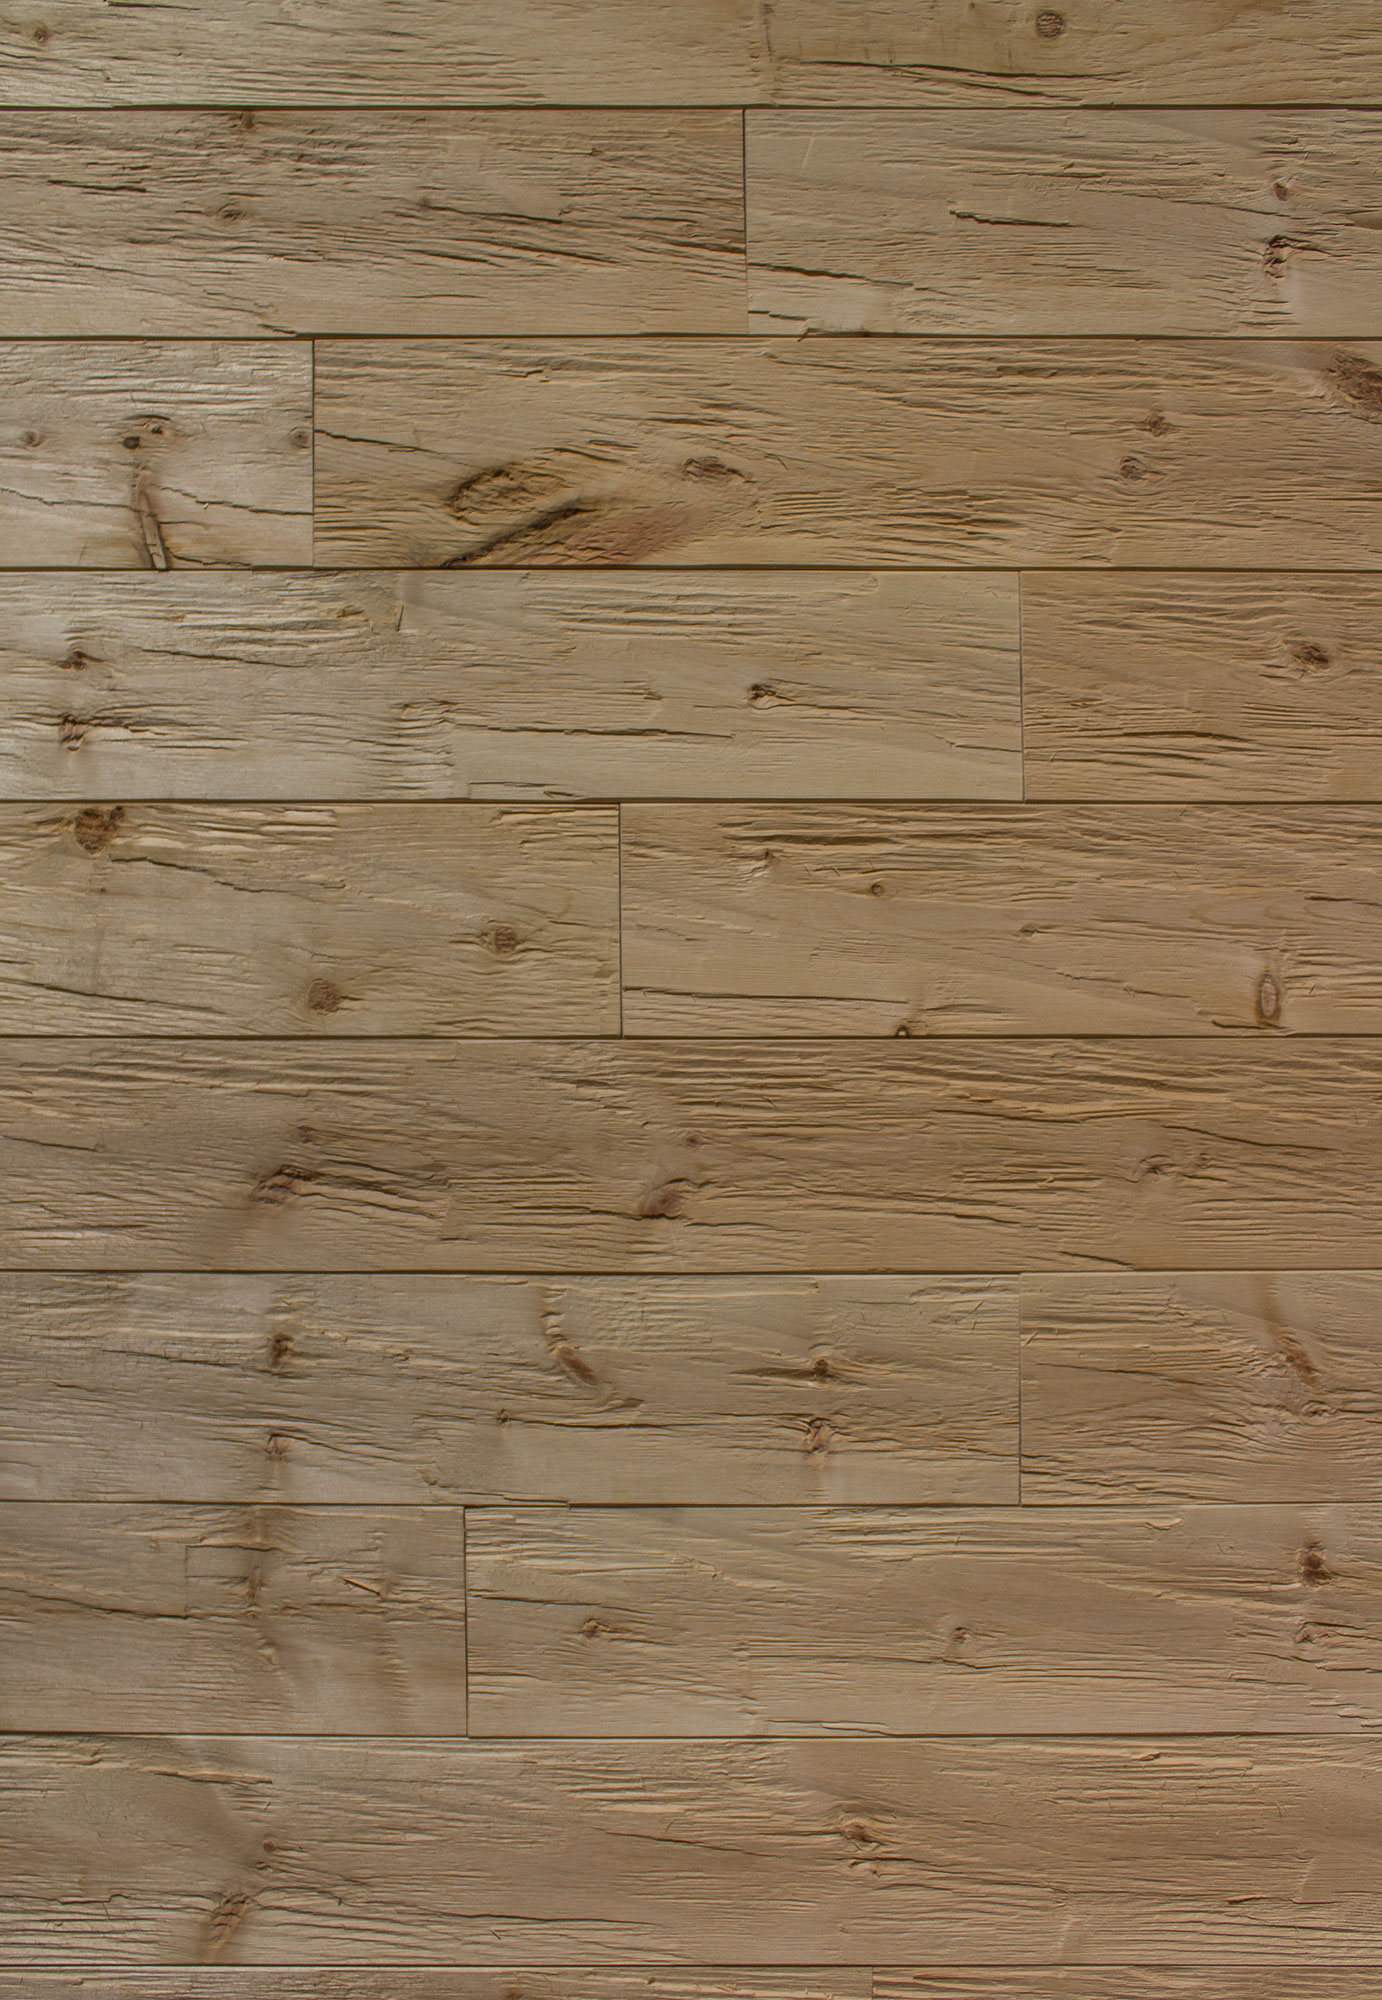 massivholzdiele f r wandverkleidung tiroler zirbe. Black Bedroom Furniture Sets. Home Design Ideas